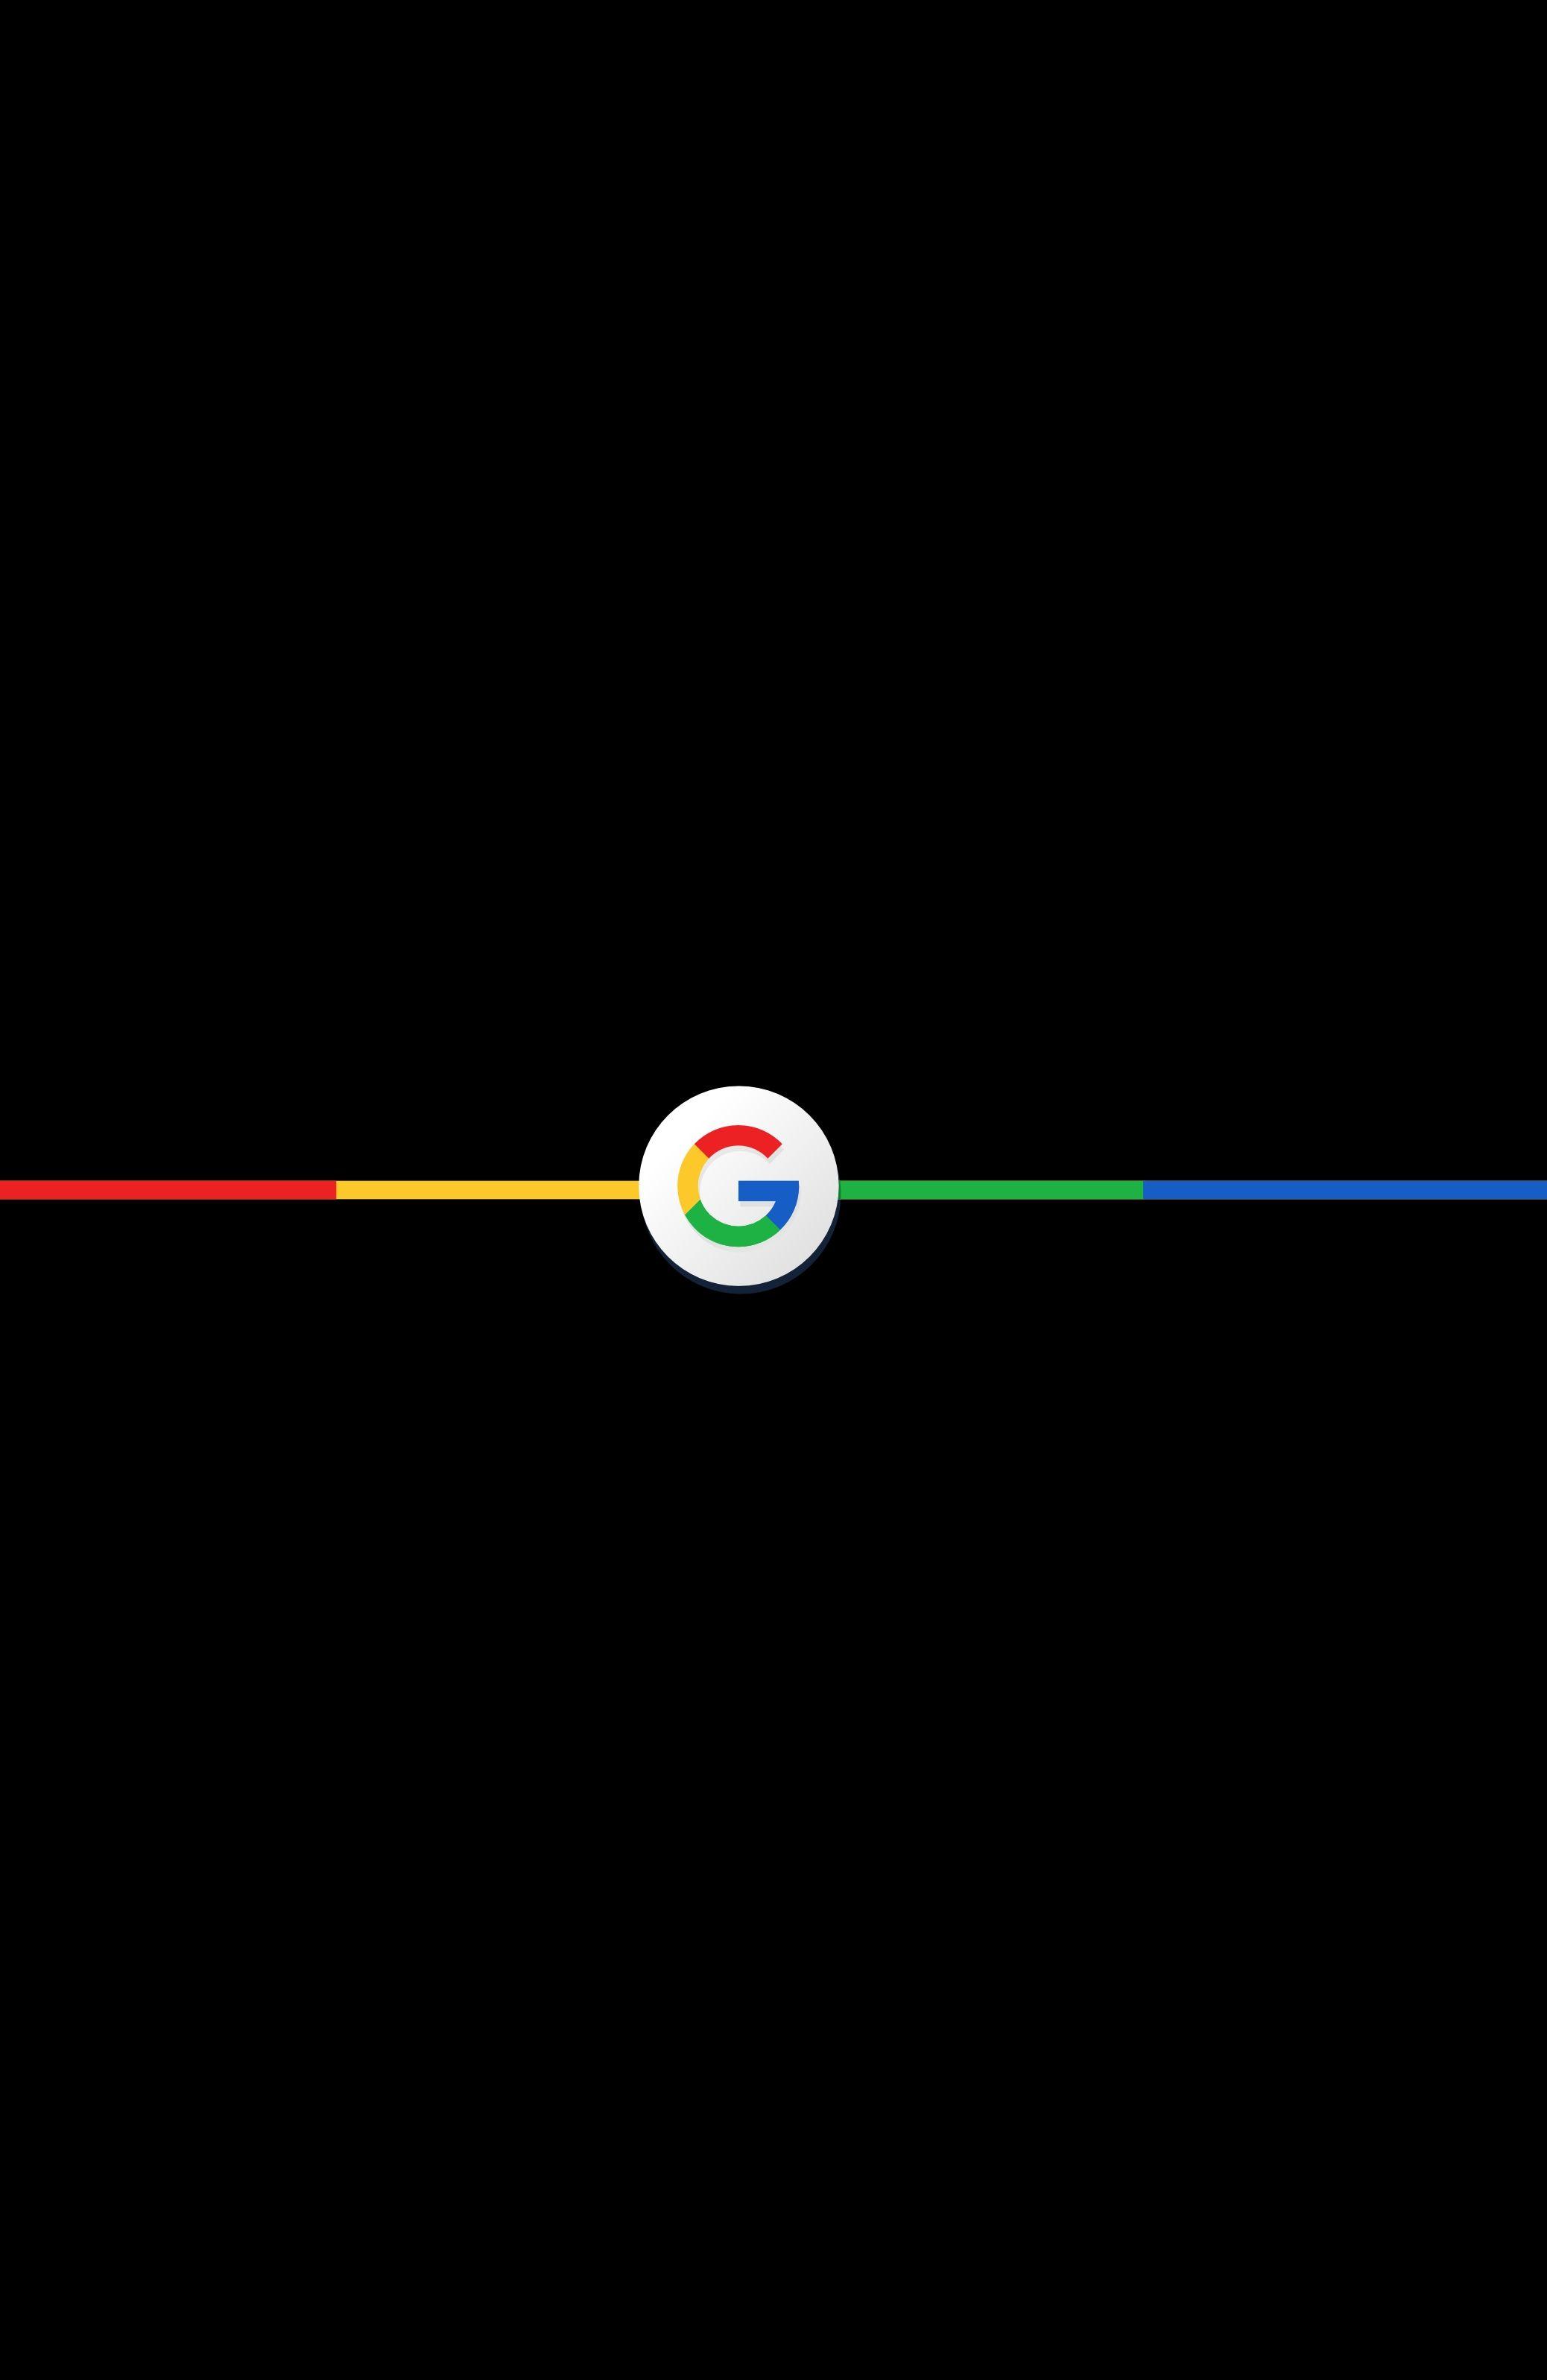 Amoled Wallpaper Google Logo Google Logo Google Pixel Wallpaper Logo Wallpaper Hd